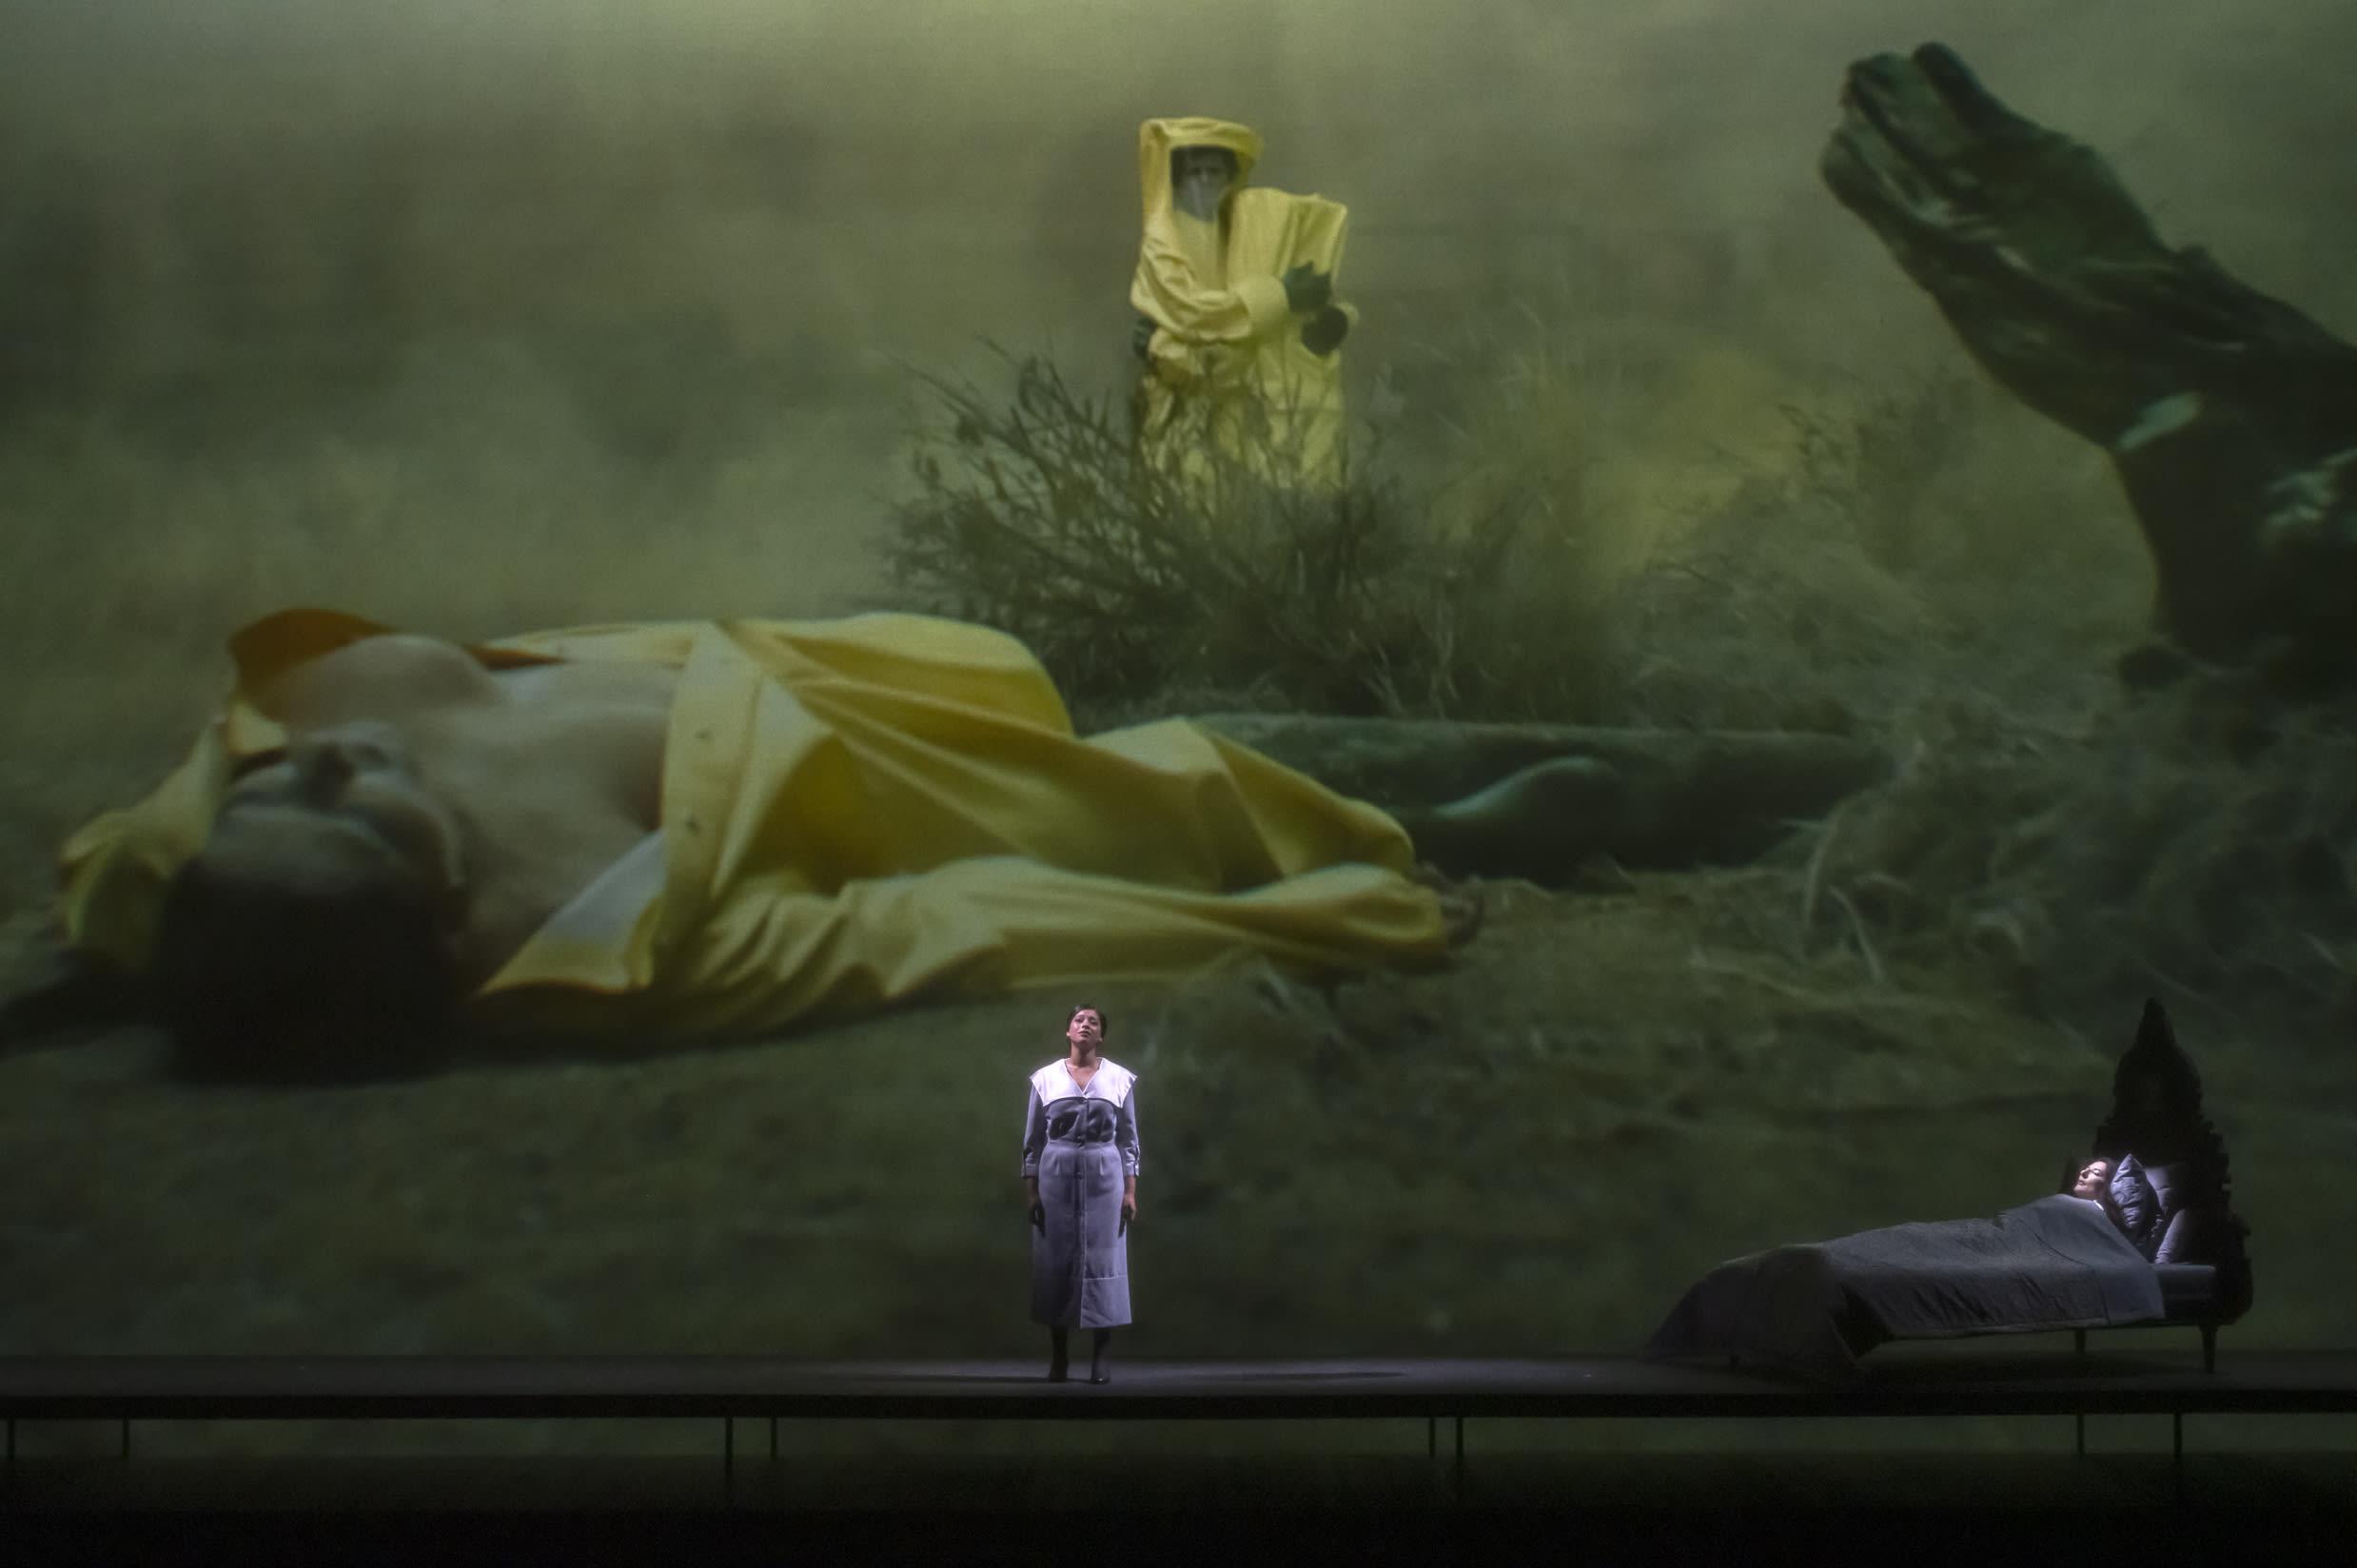 7 Deaths of Maria Callas 21-22 © Charles Duprat - OnP (15)